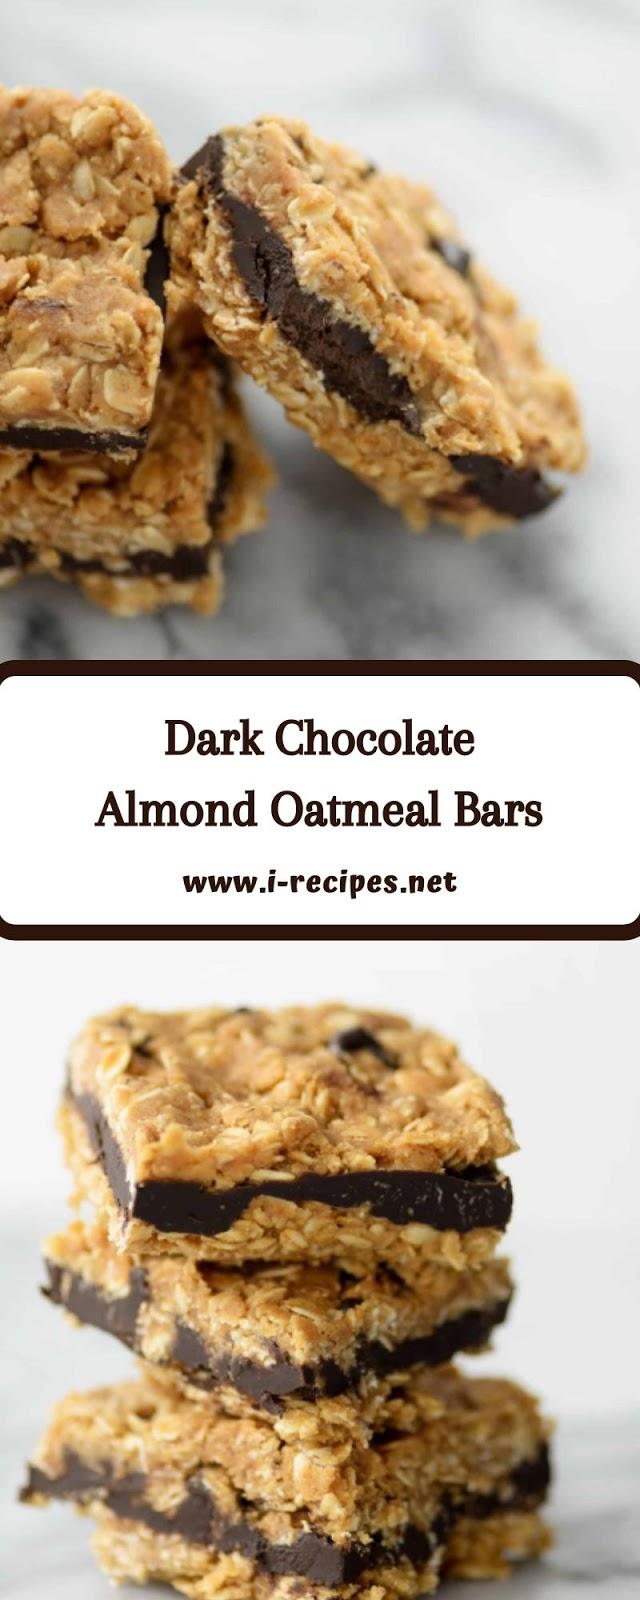 Dark Chocolate Almond Oatmeal Bars